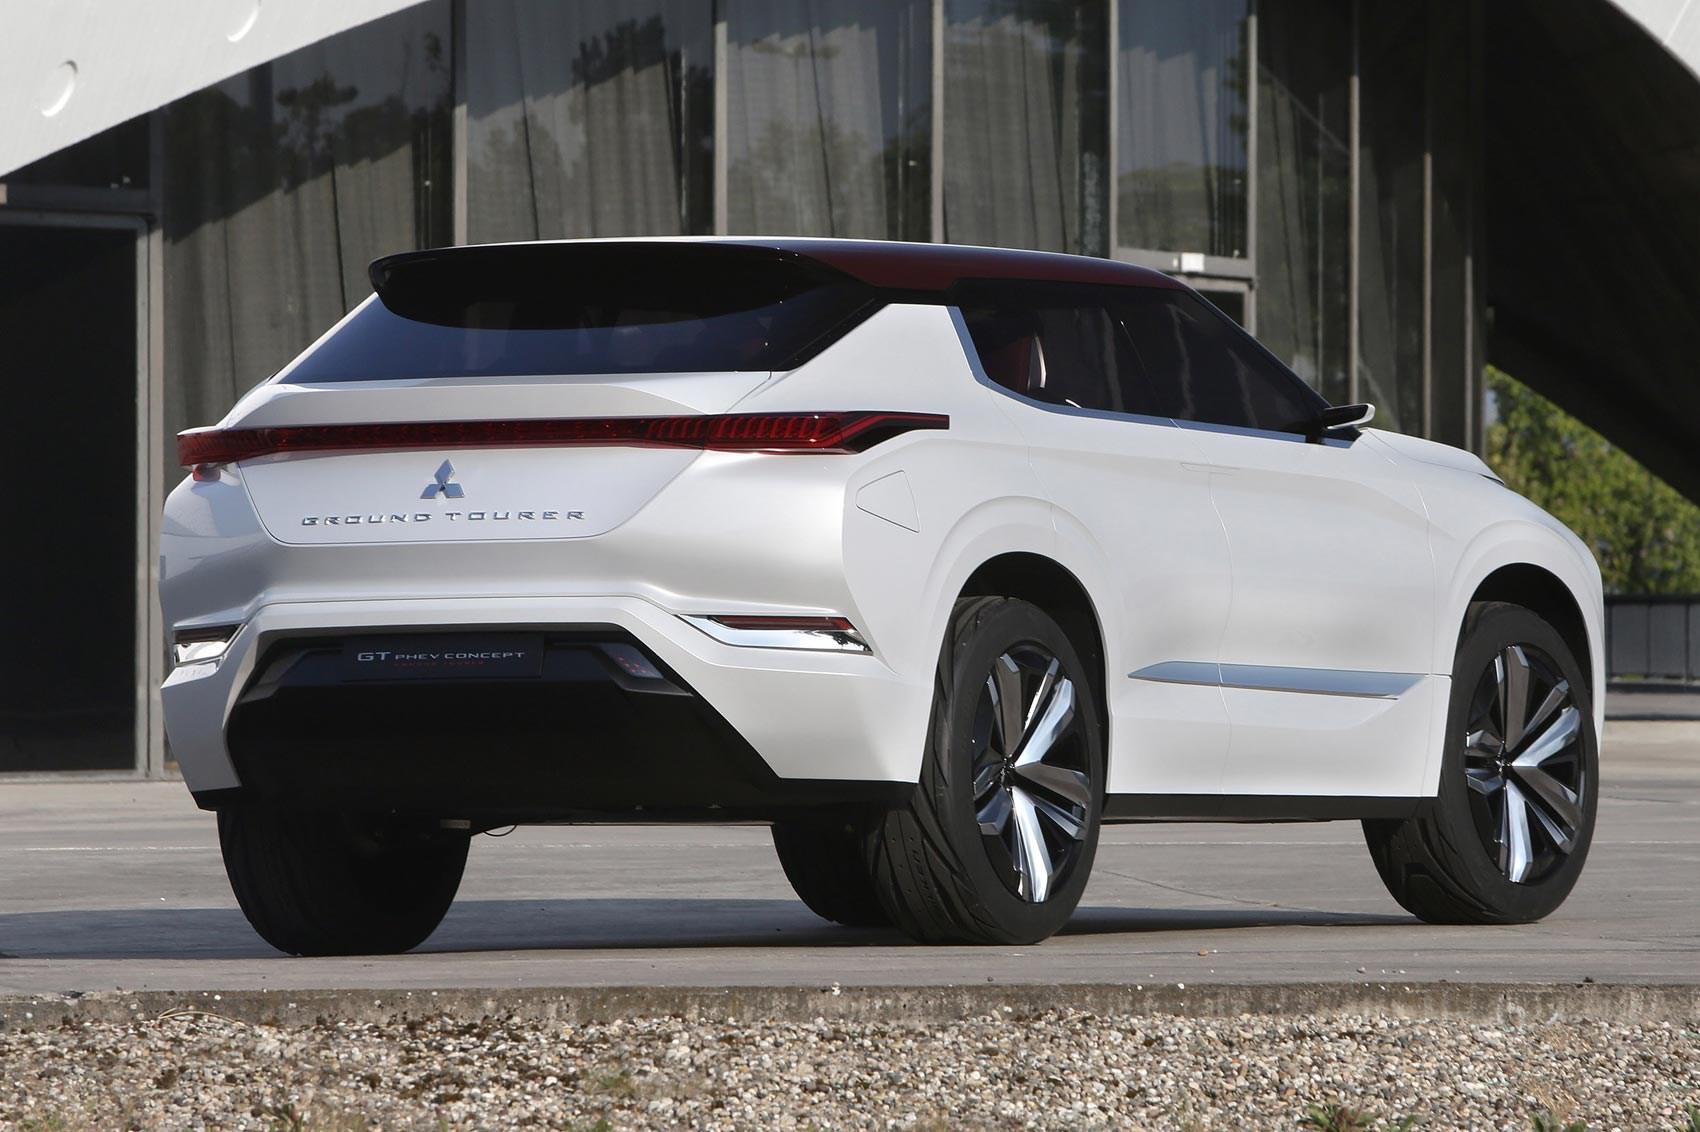 triple play: mitsubishi gt-phev concept revealed at paris 2016 | car